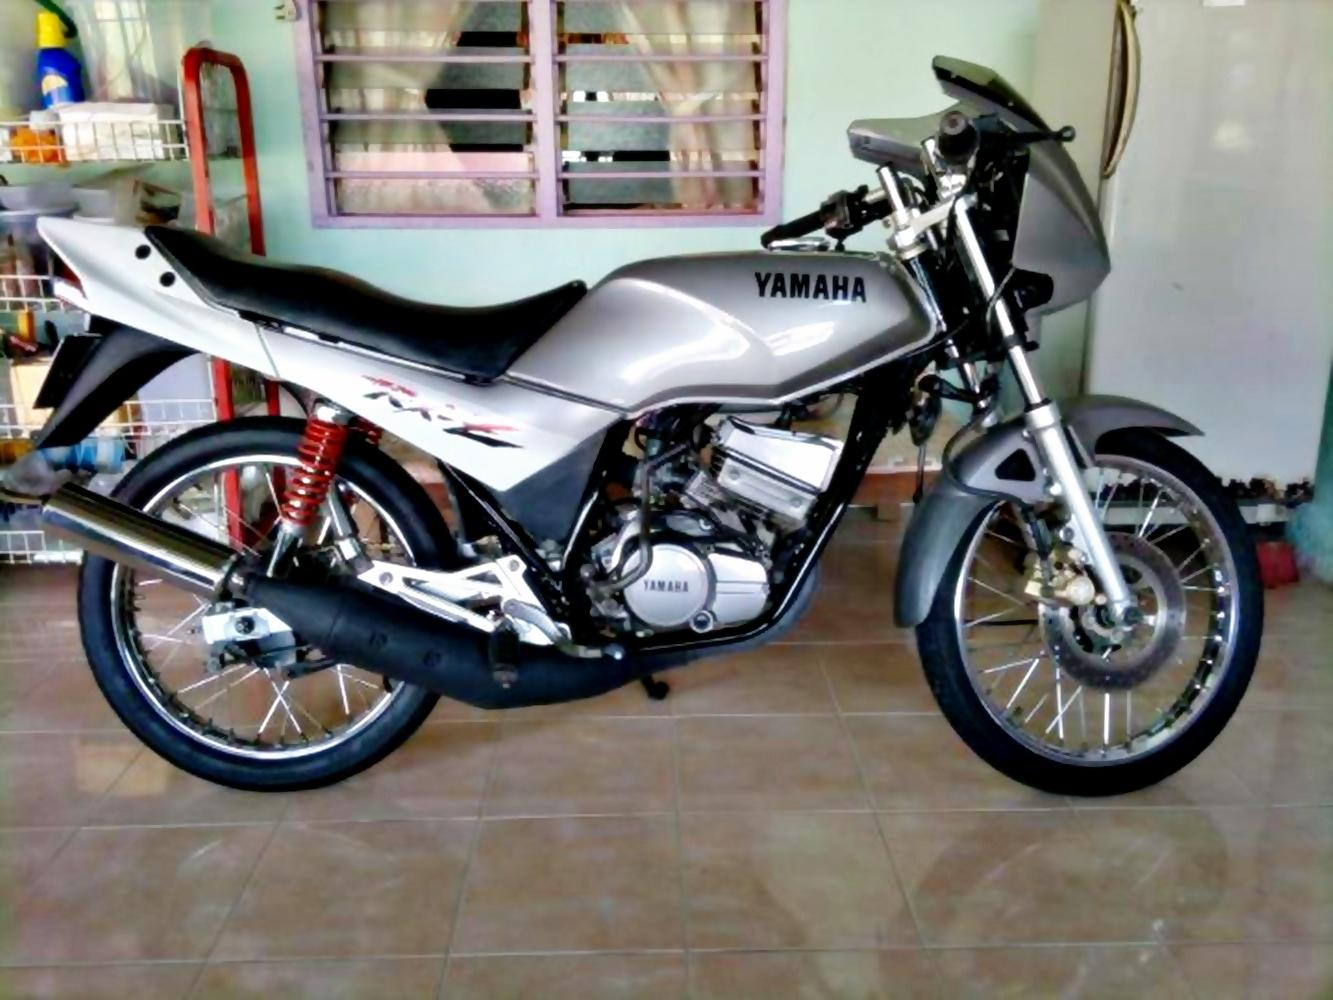 Kumpulan 92 Gambar Motor Yamaha Rxz Terupdate Motorindo69